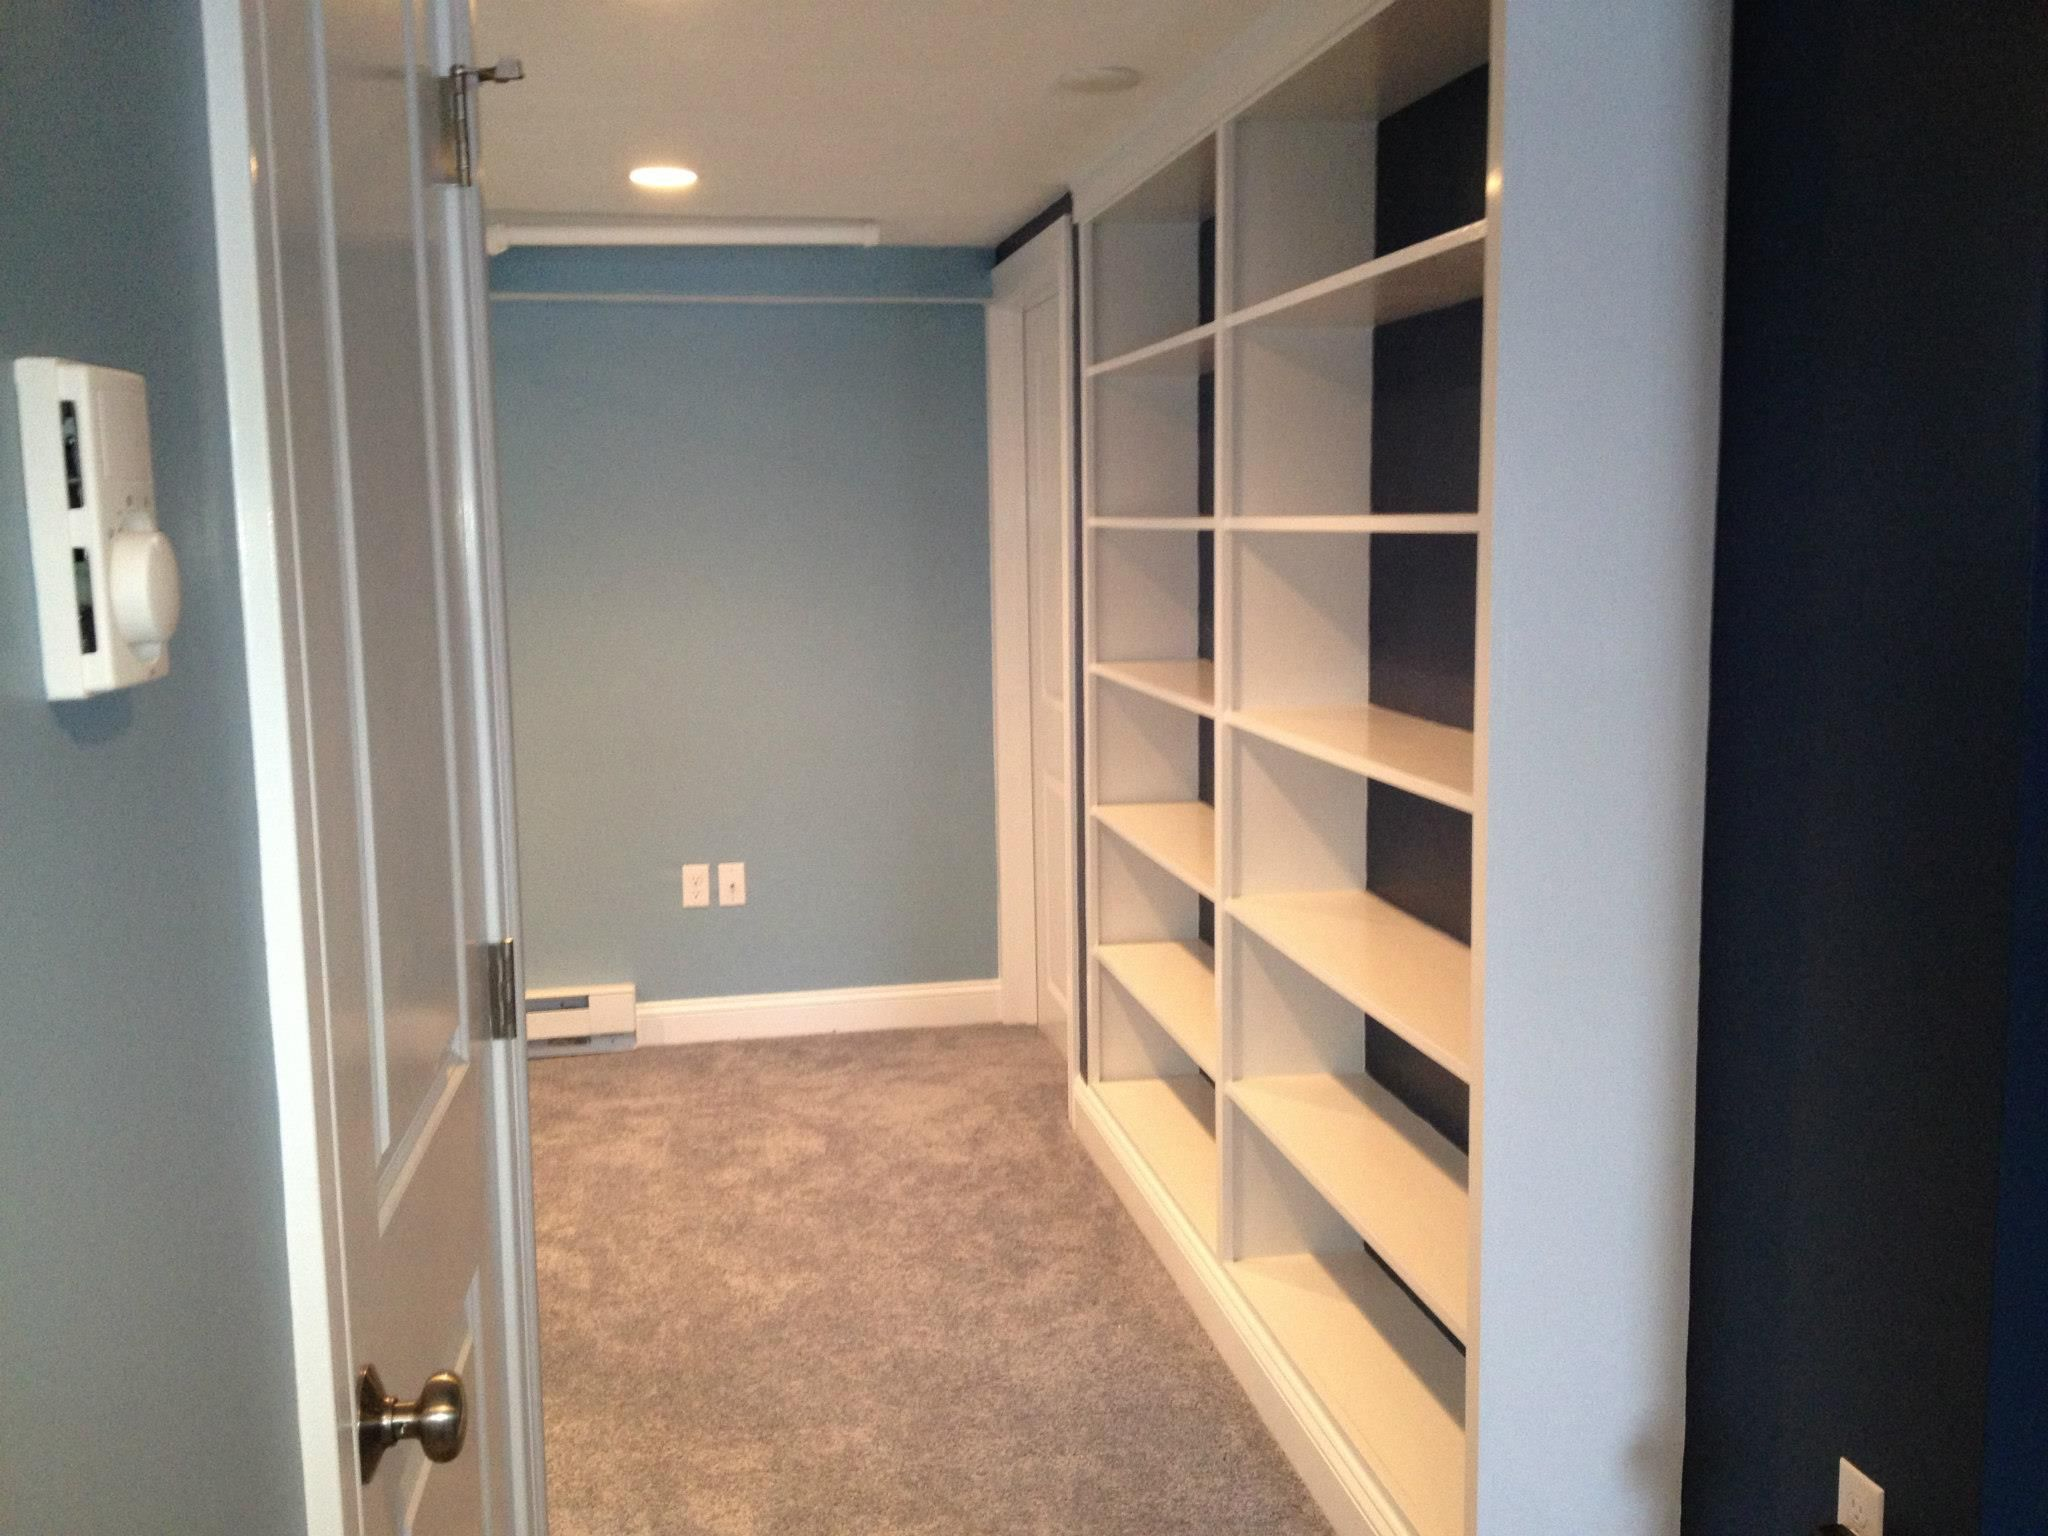 Shrewsbury, MA basement remodel with custom built-in shelving